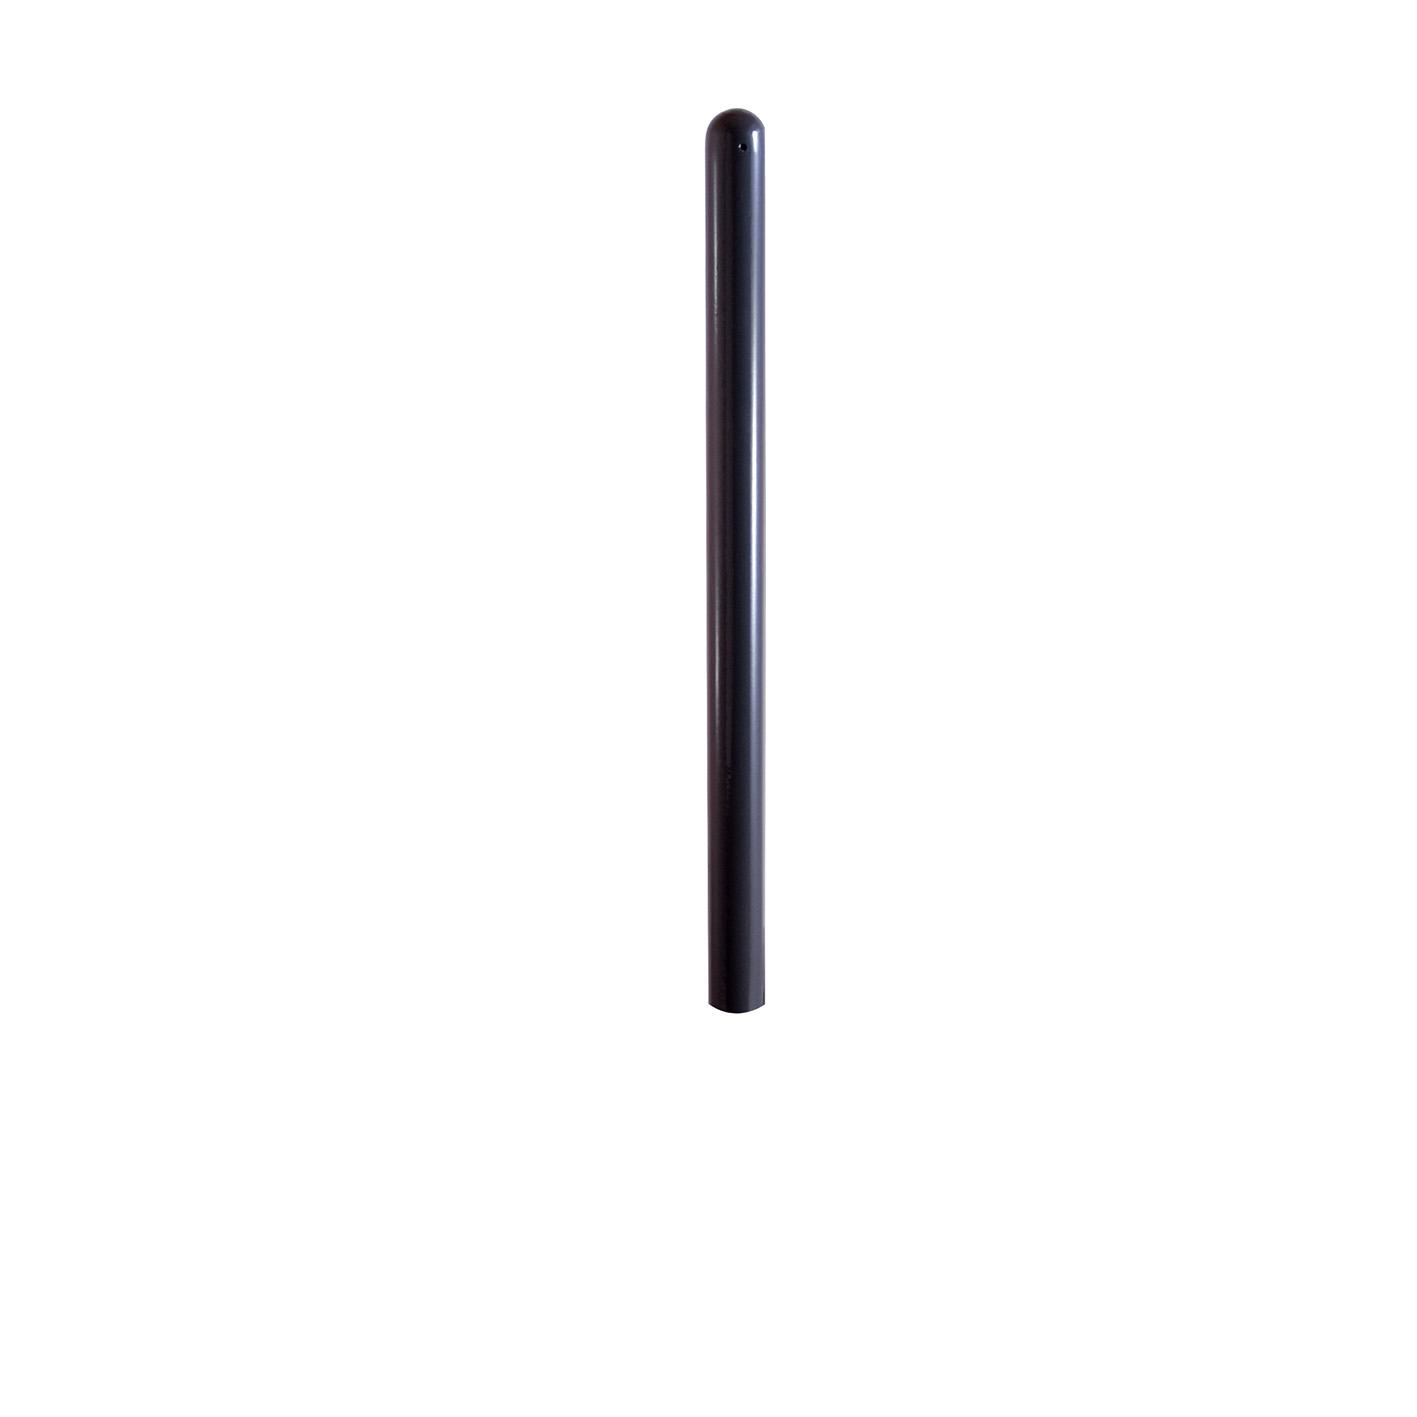 Absperrstilpfosten 468 | Ø 60 x 950 mm